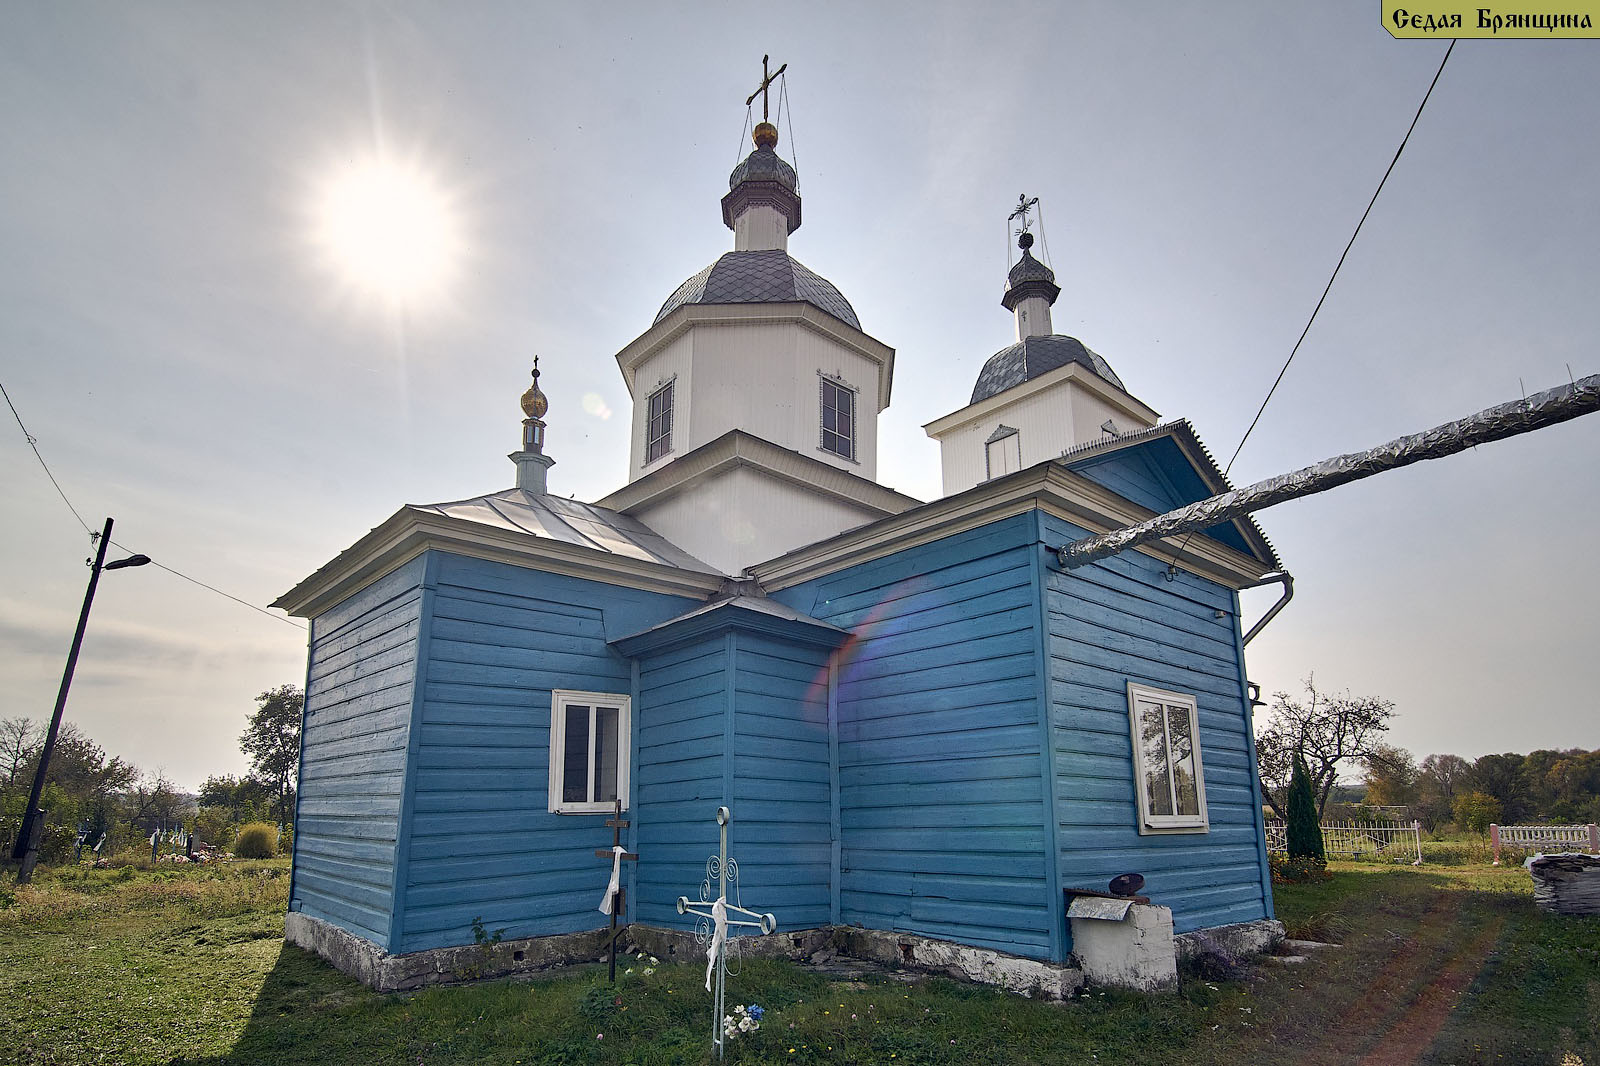 Заречное. Церковь Параскевы Пятницы